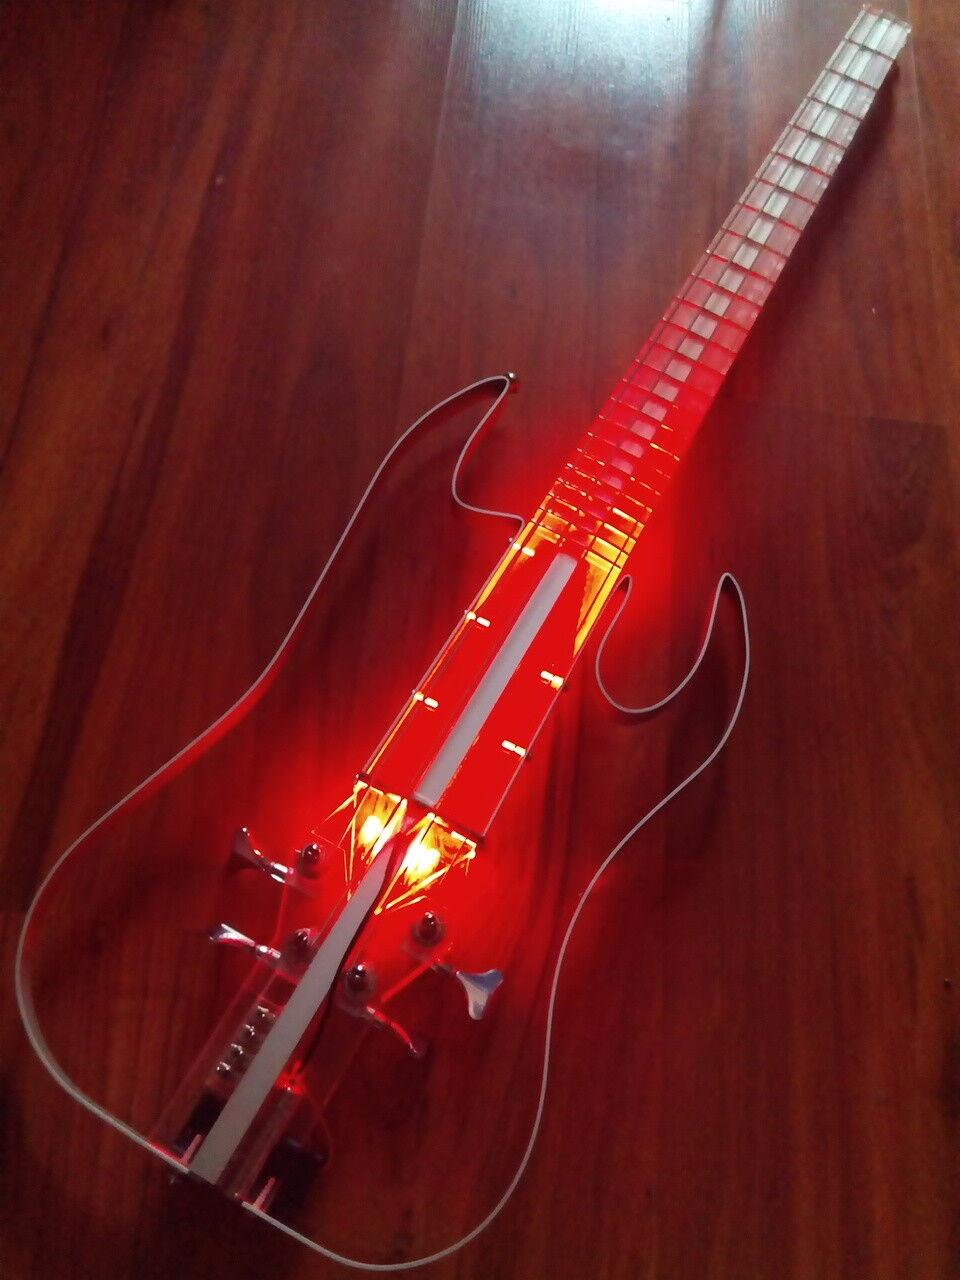 30% OFF NEW Equester acrylic silent bass guitar, handmade, short scale, headless